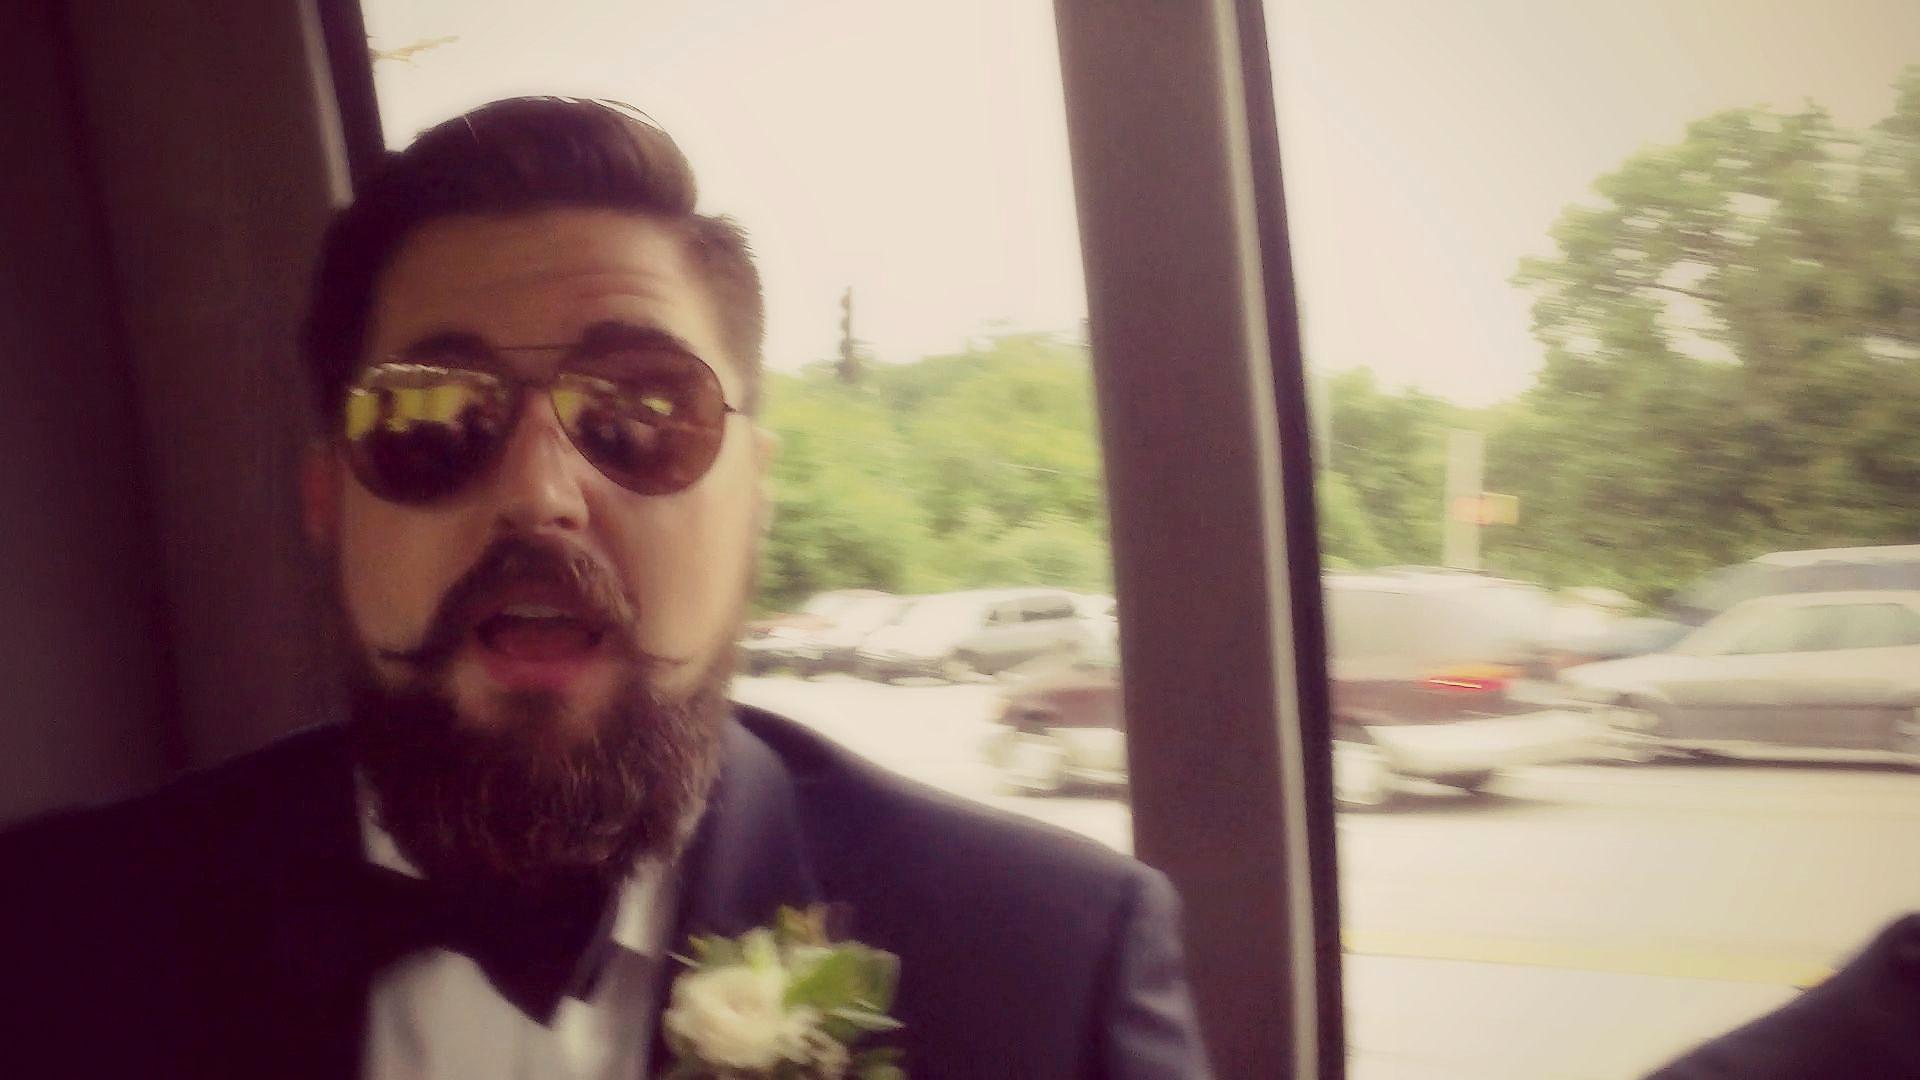 beardepic.jpg